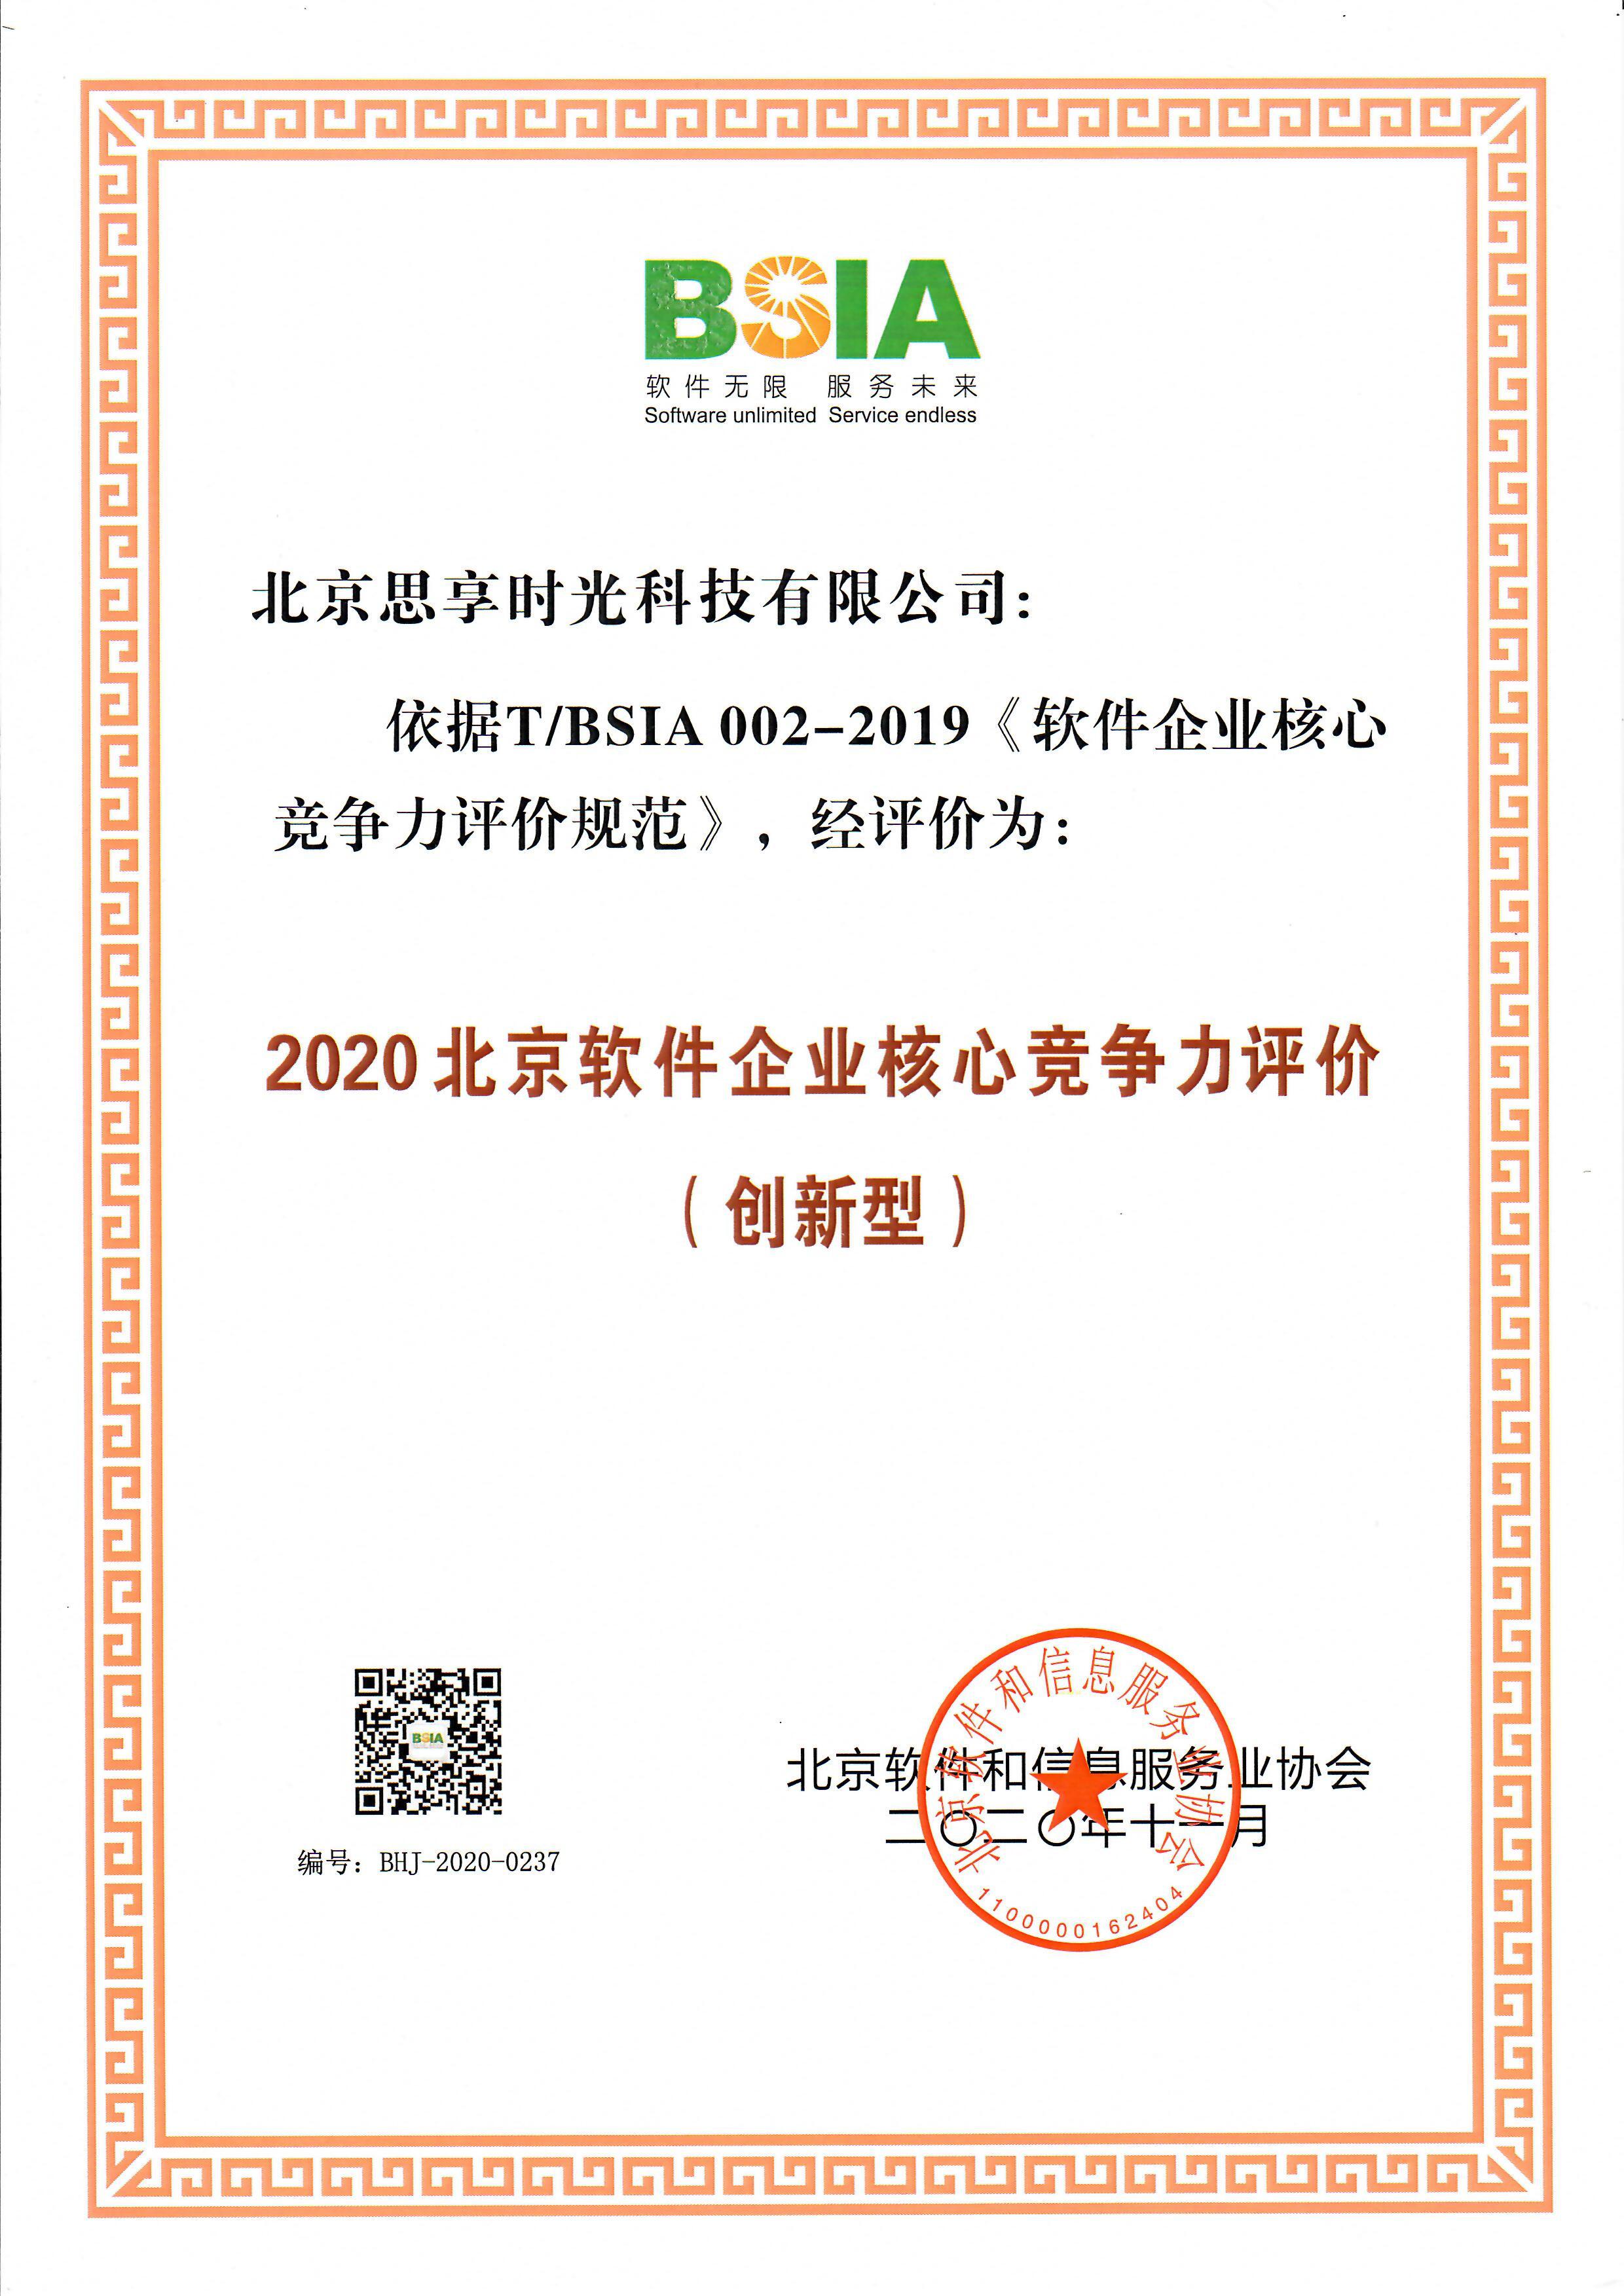 Beijing Software Enterprise Core Competitiveness Innovation Enterprise 2020